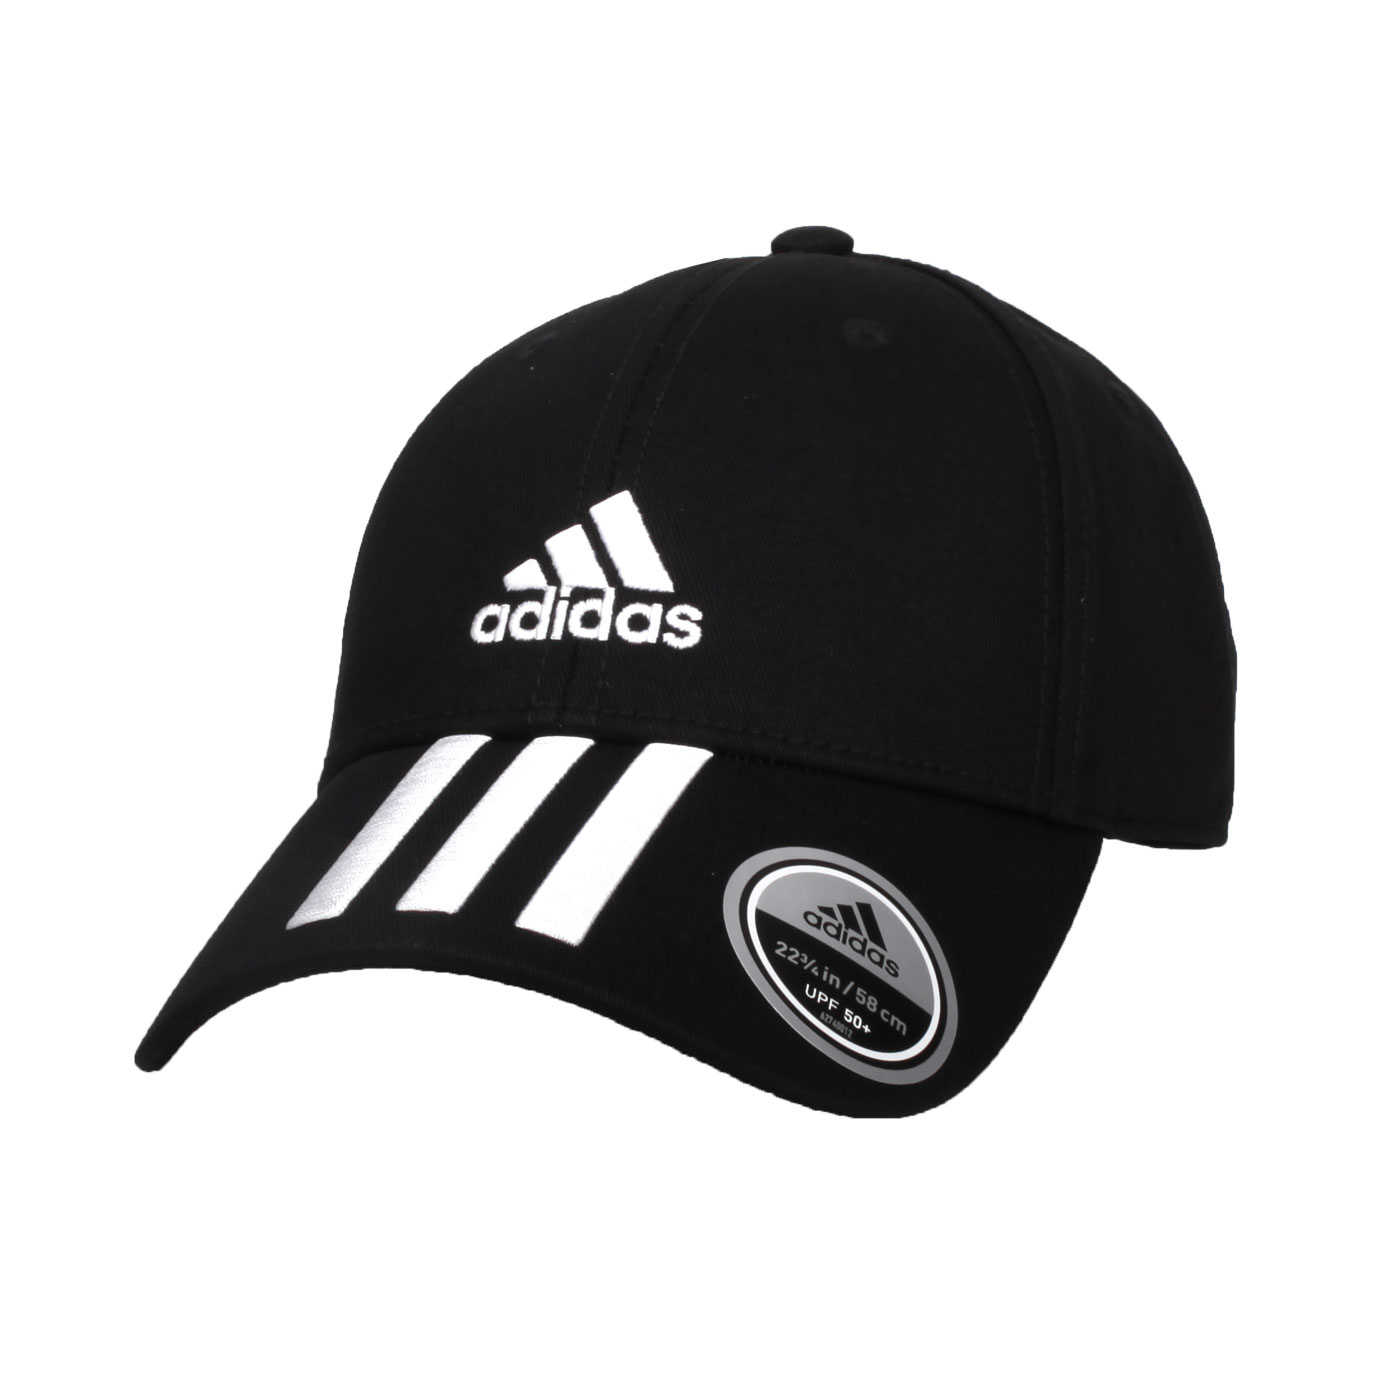 ADIDAS 運動帽 FK0894 - 黑白